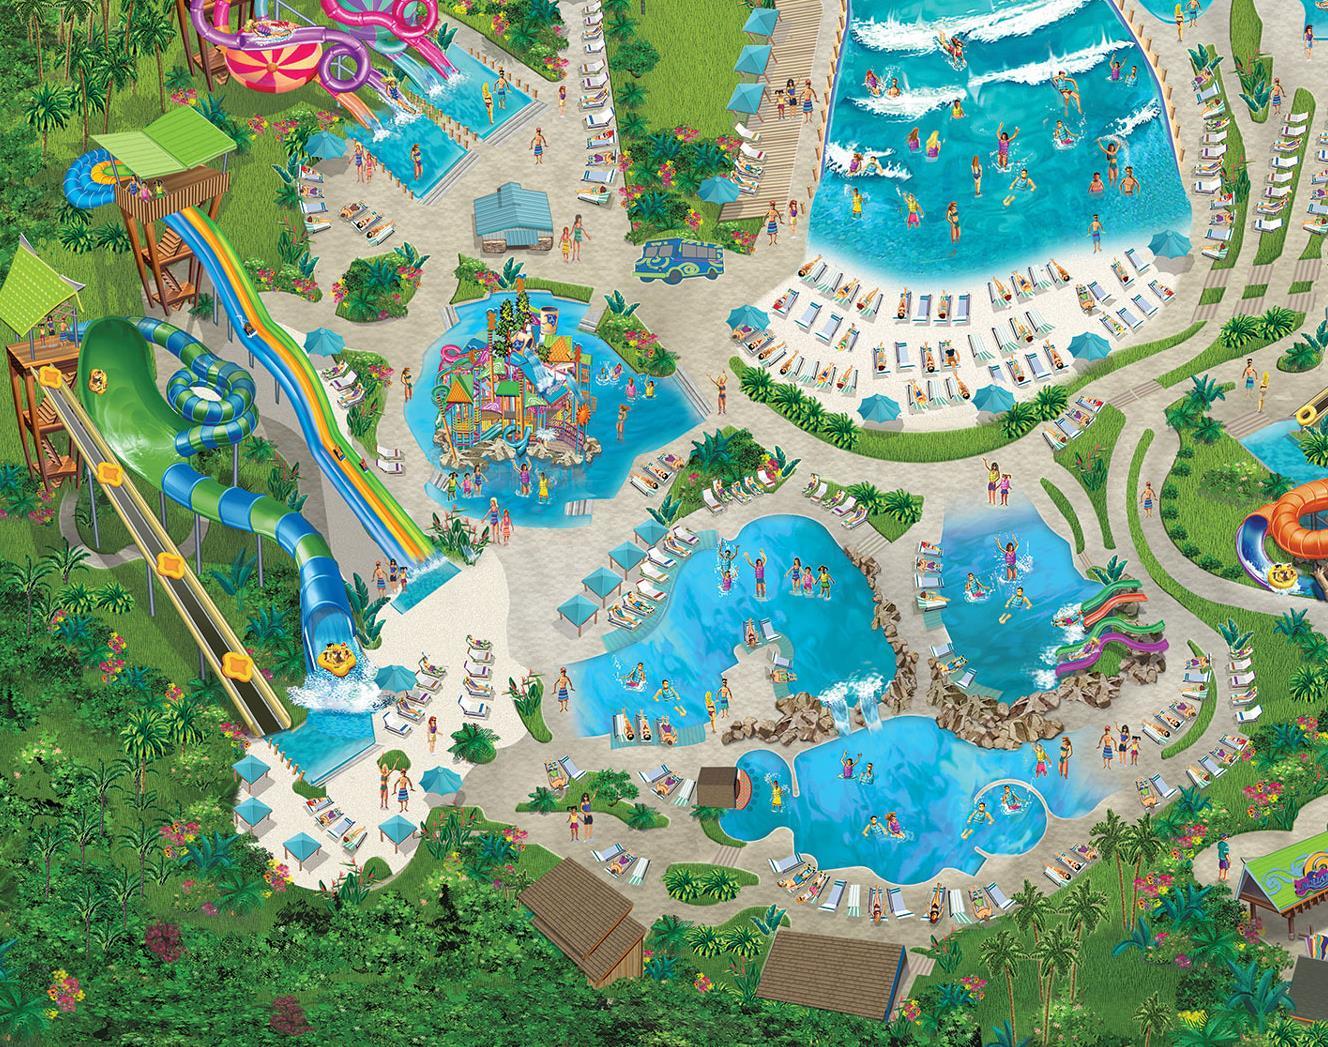 map of seaworld san antonio Tassie S Twisters Tube Slide Aquatica San Antonio map of seaworld san antonio